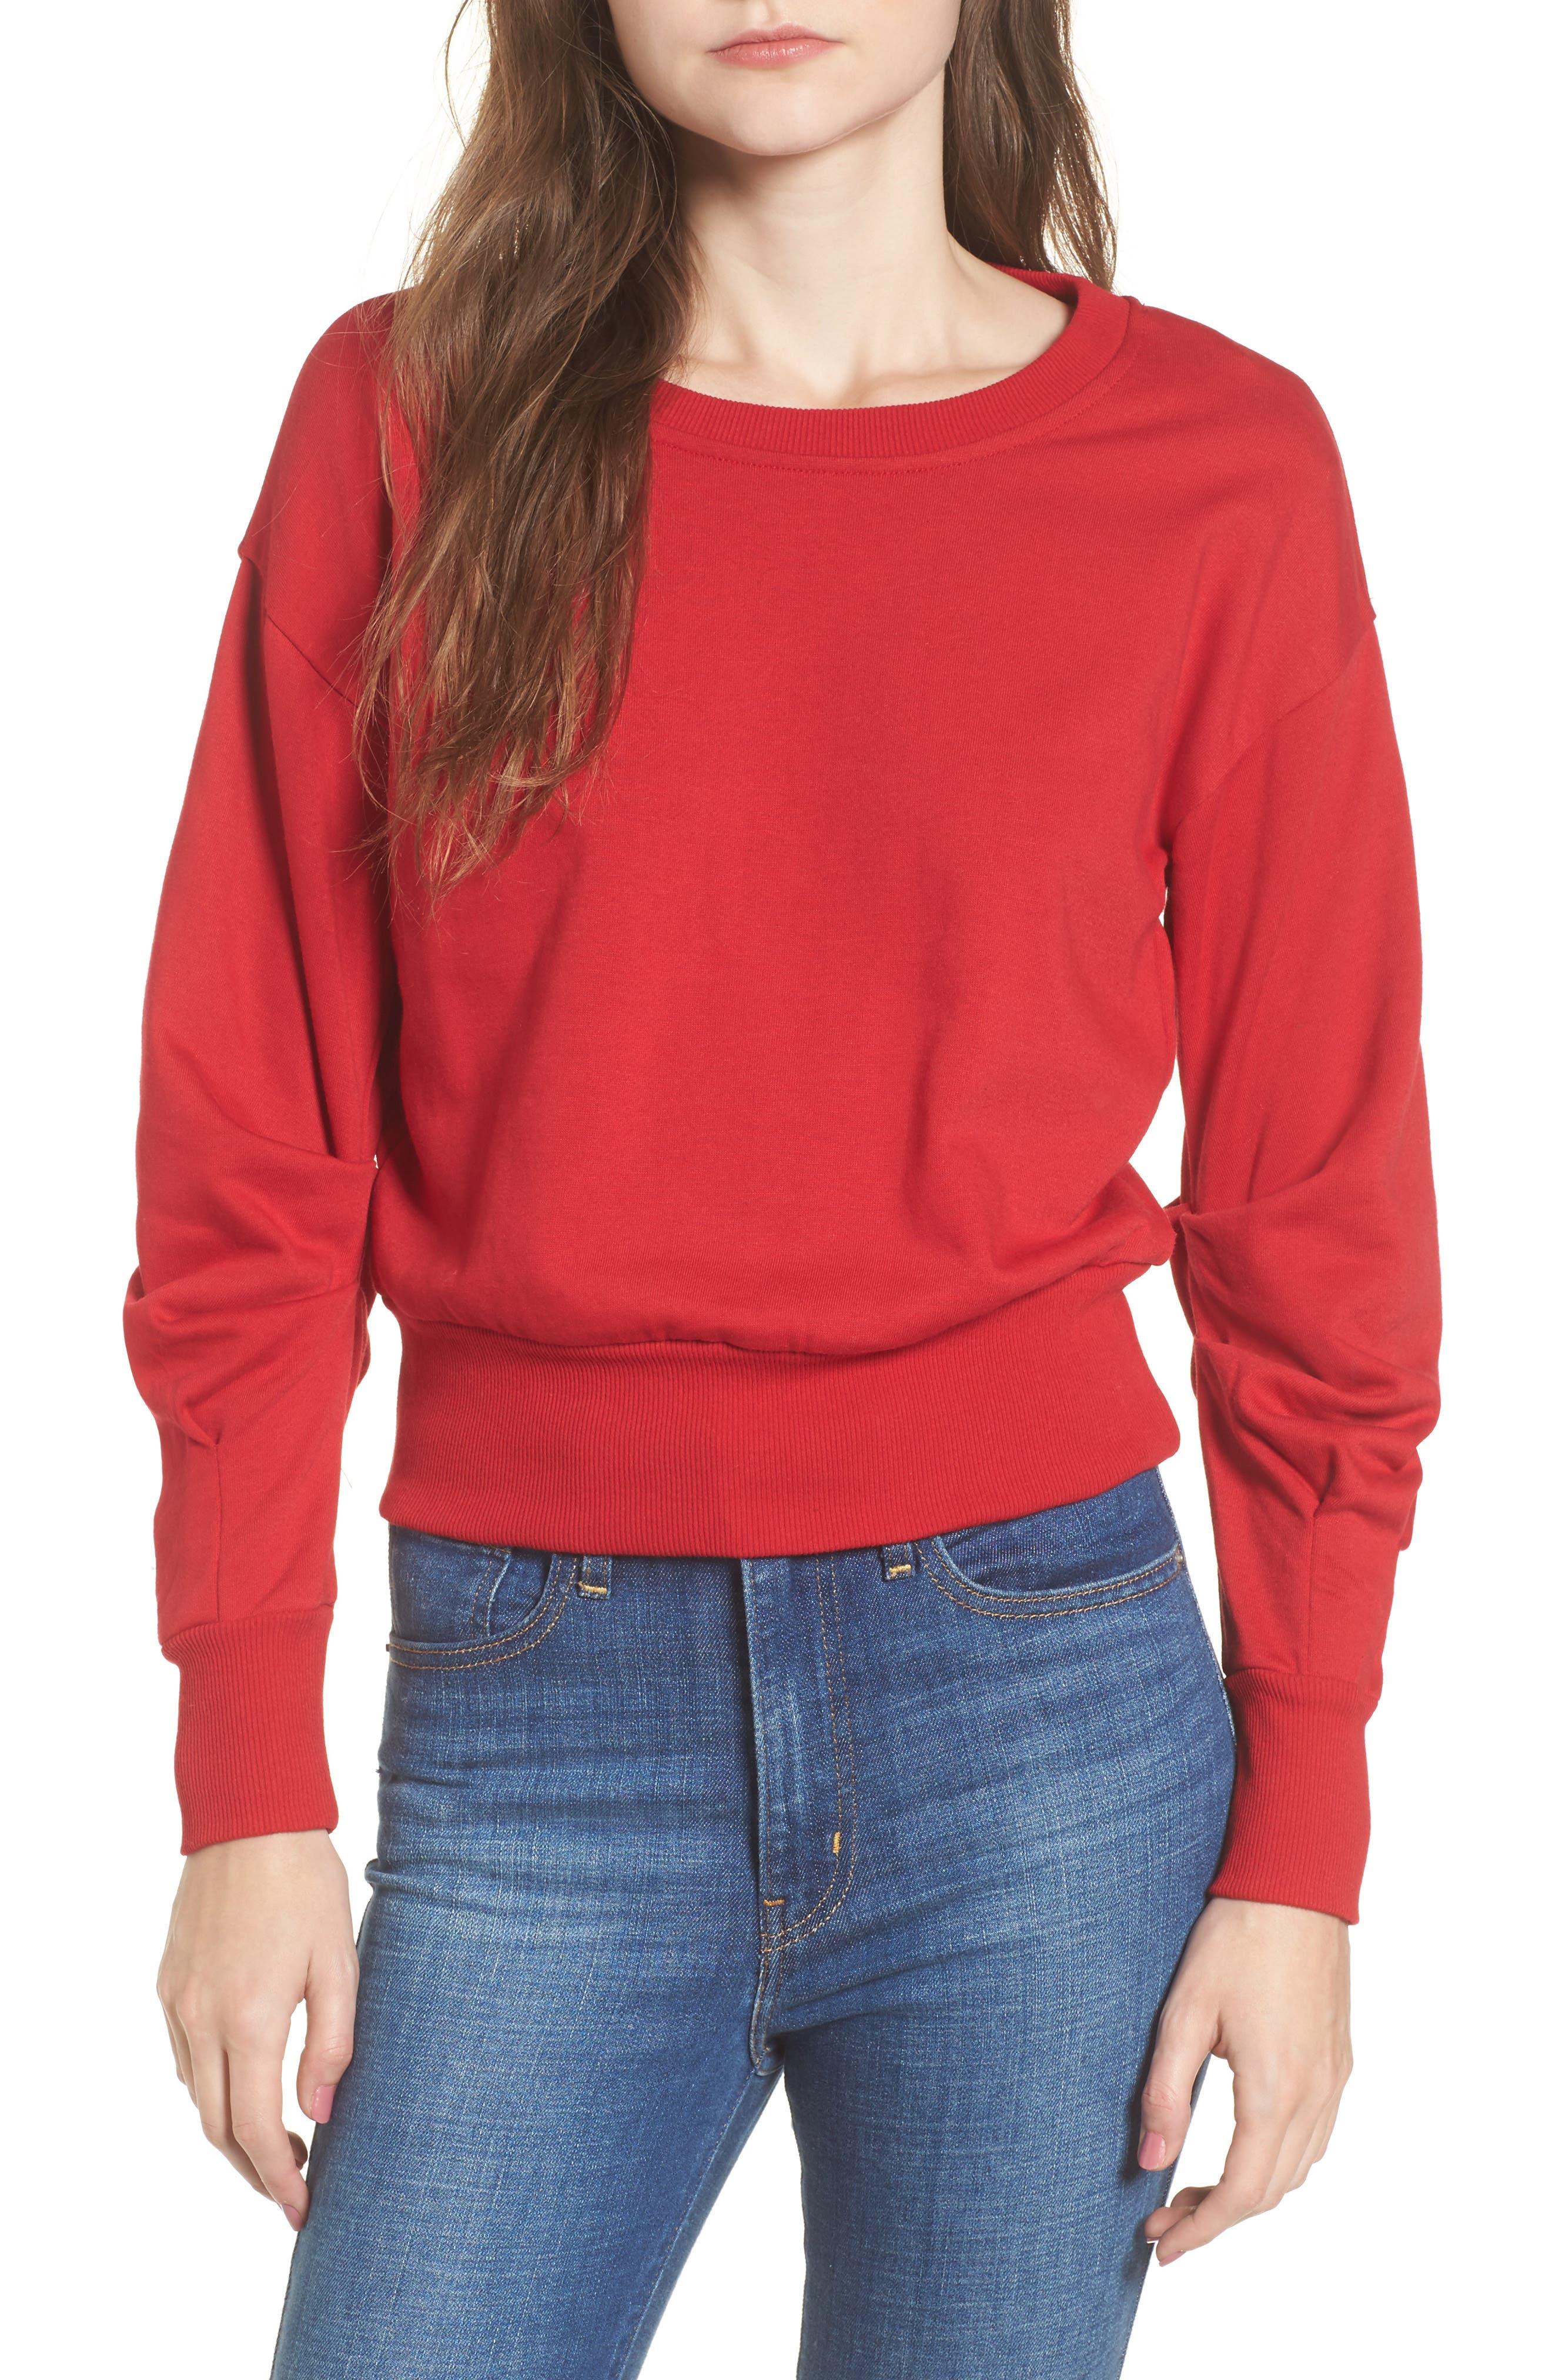 Main Image - Socialite Ruched Sleeve Sweatshirt